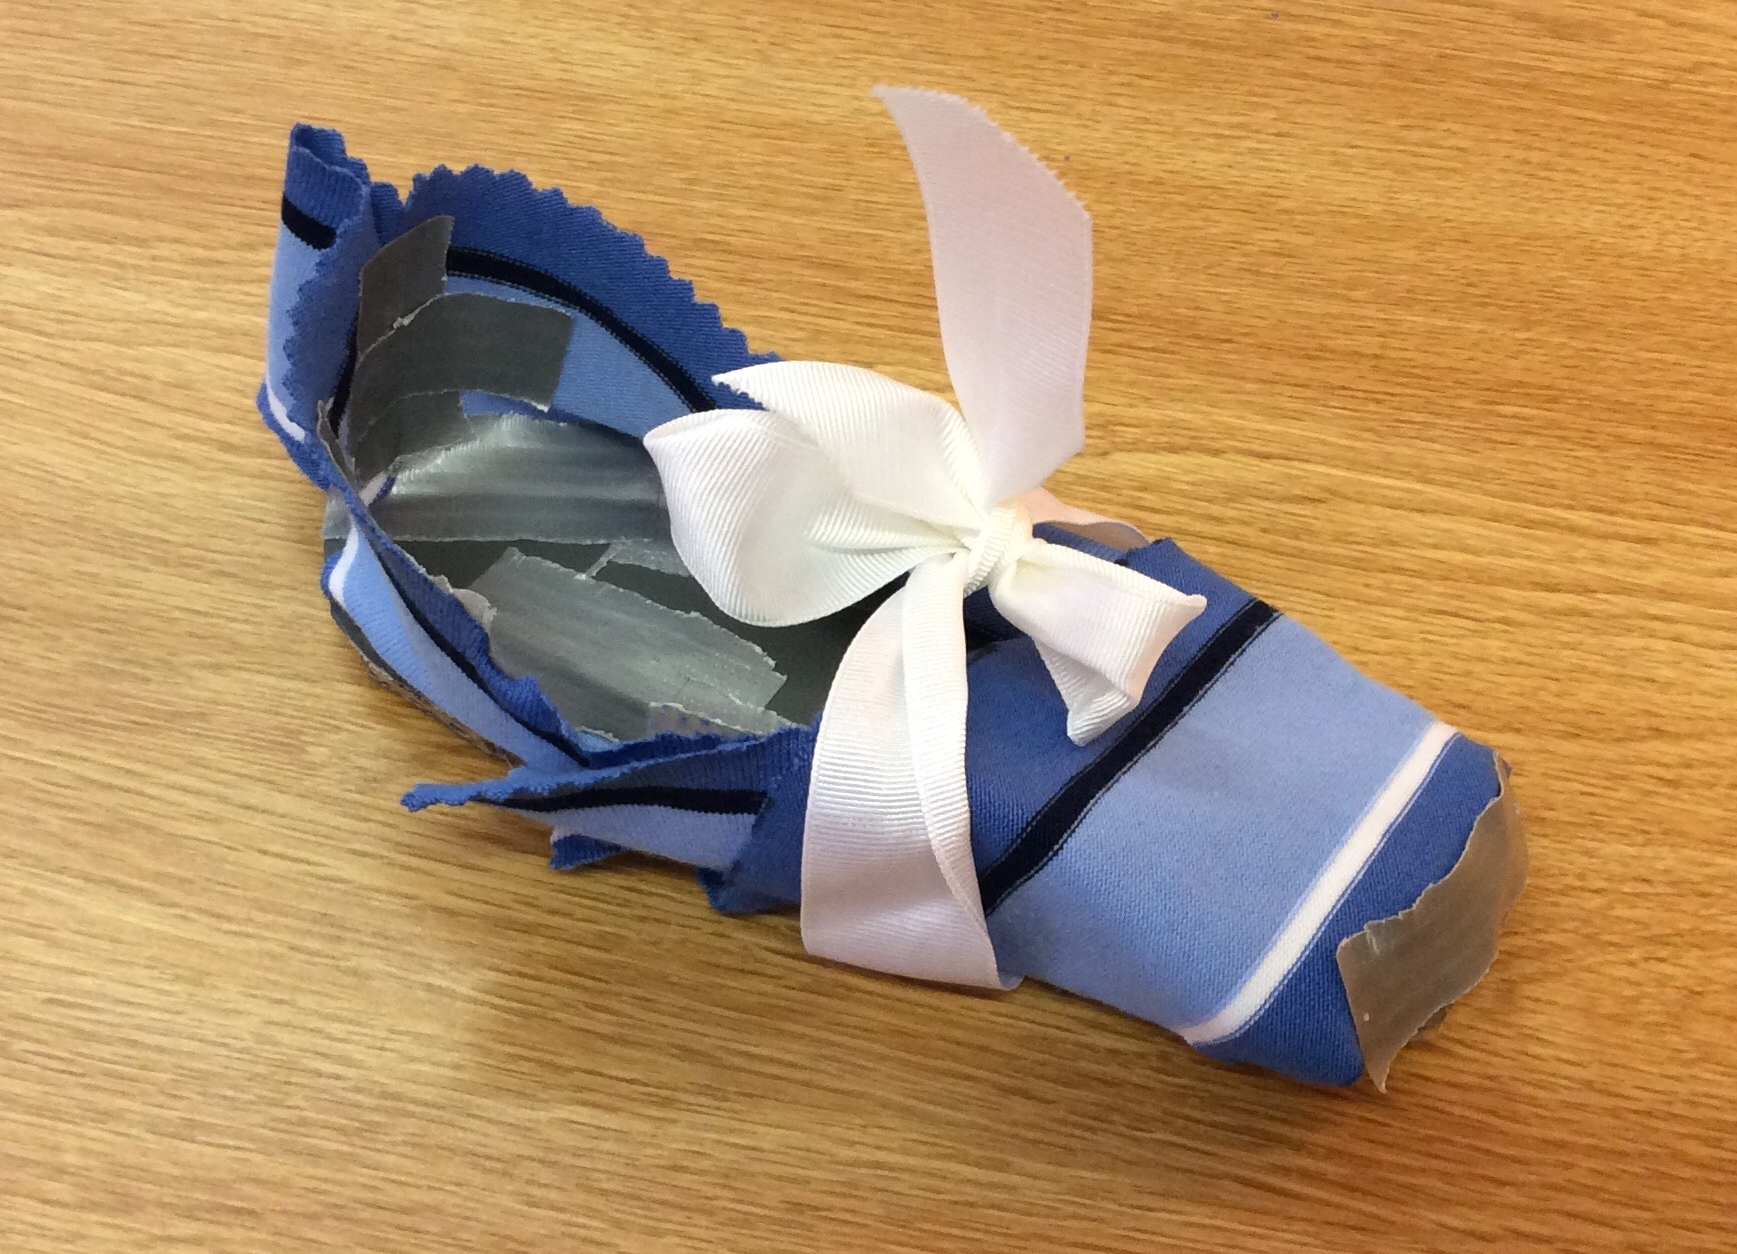 Figure 7. A ballerina-inspired shoe.jpg